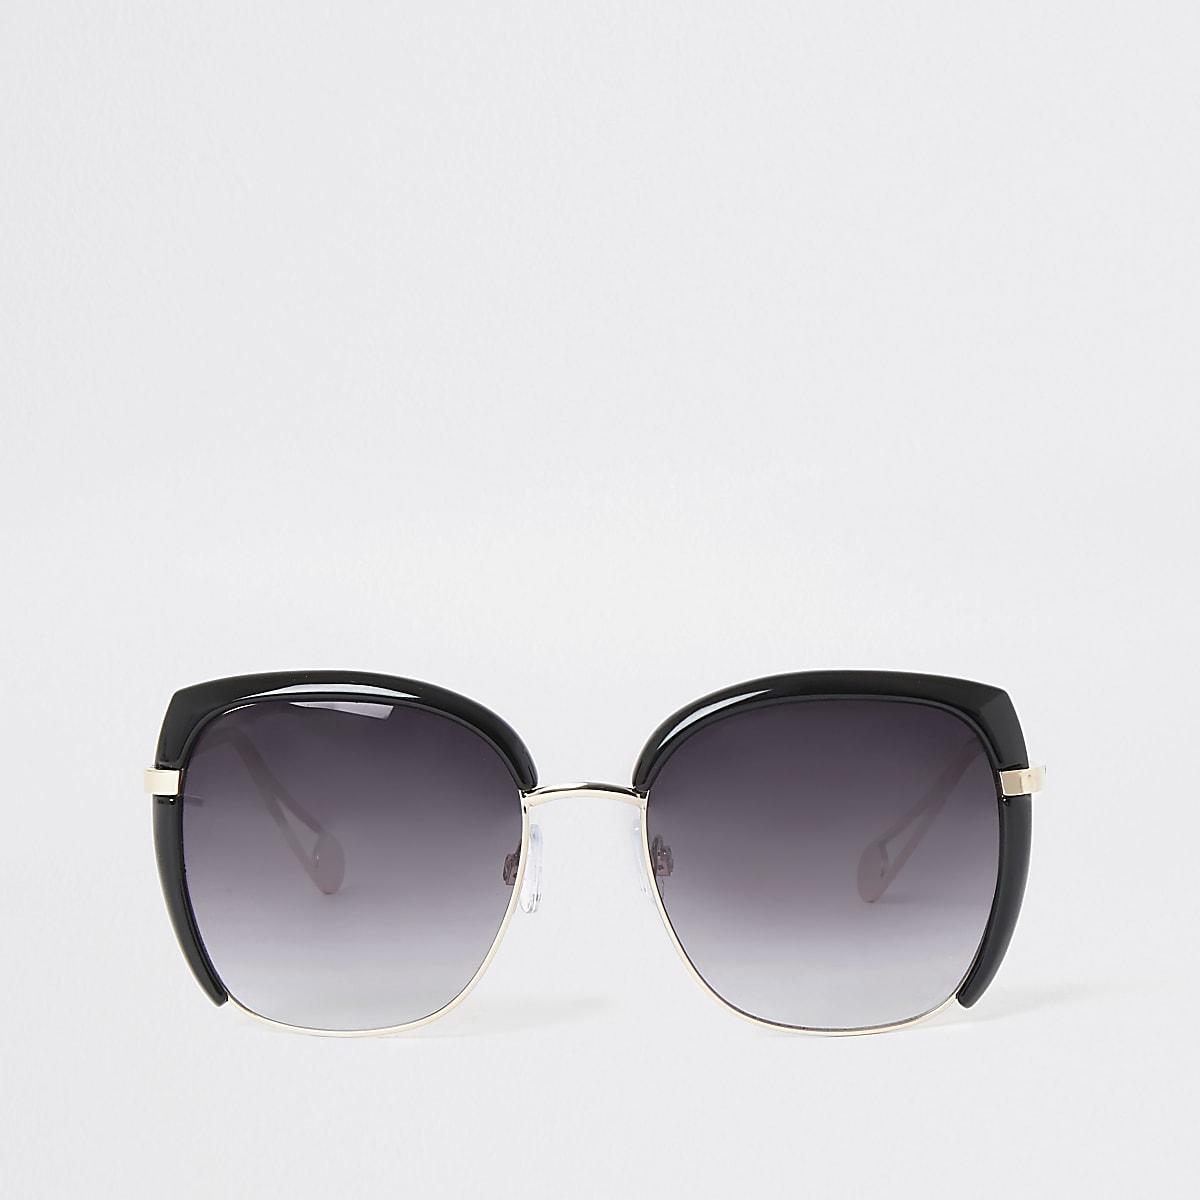 Black smoke lens glam sunglasses